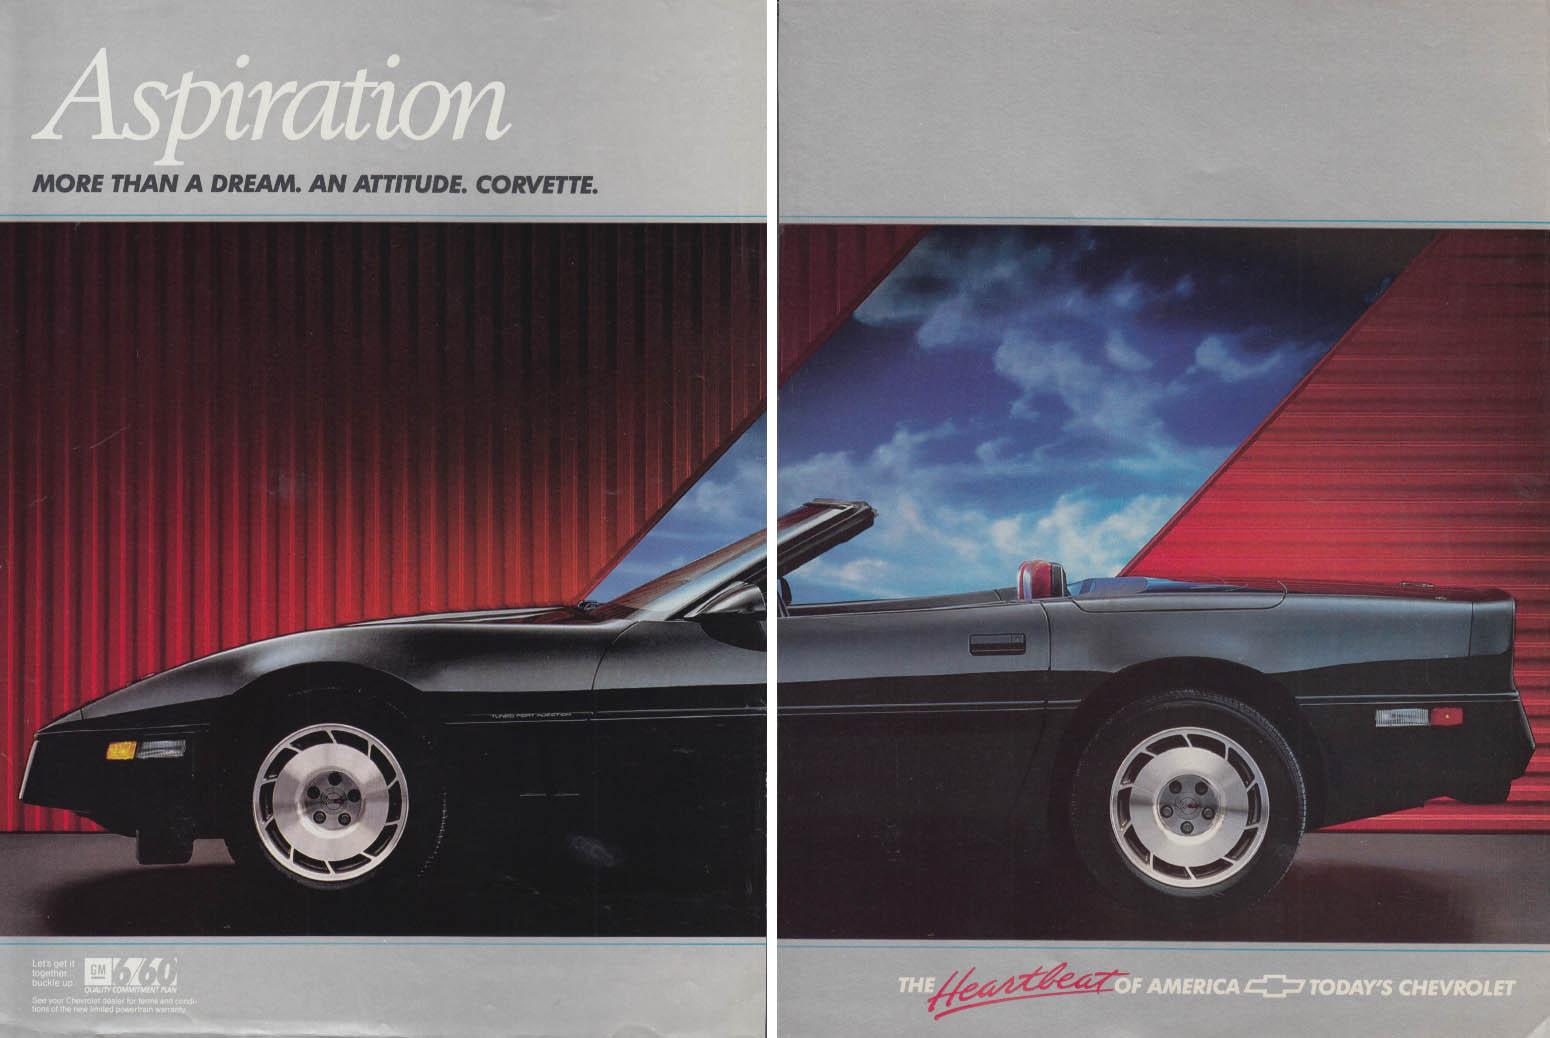 Aspiration - More than a dream, an attitude Corvette ad 1987 C&D